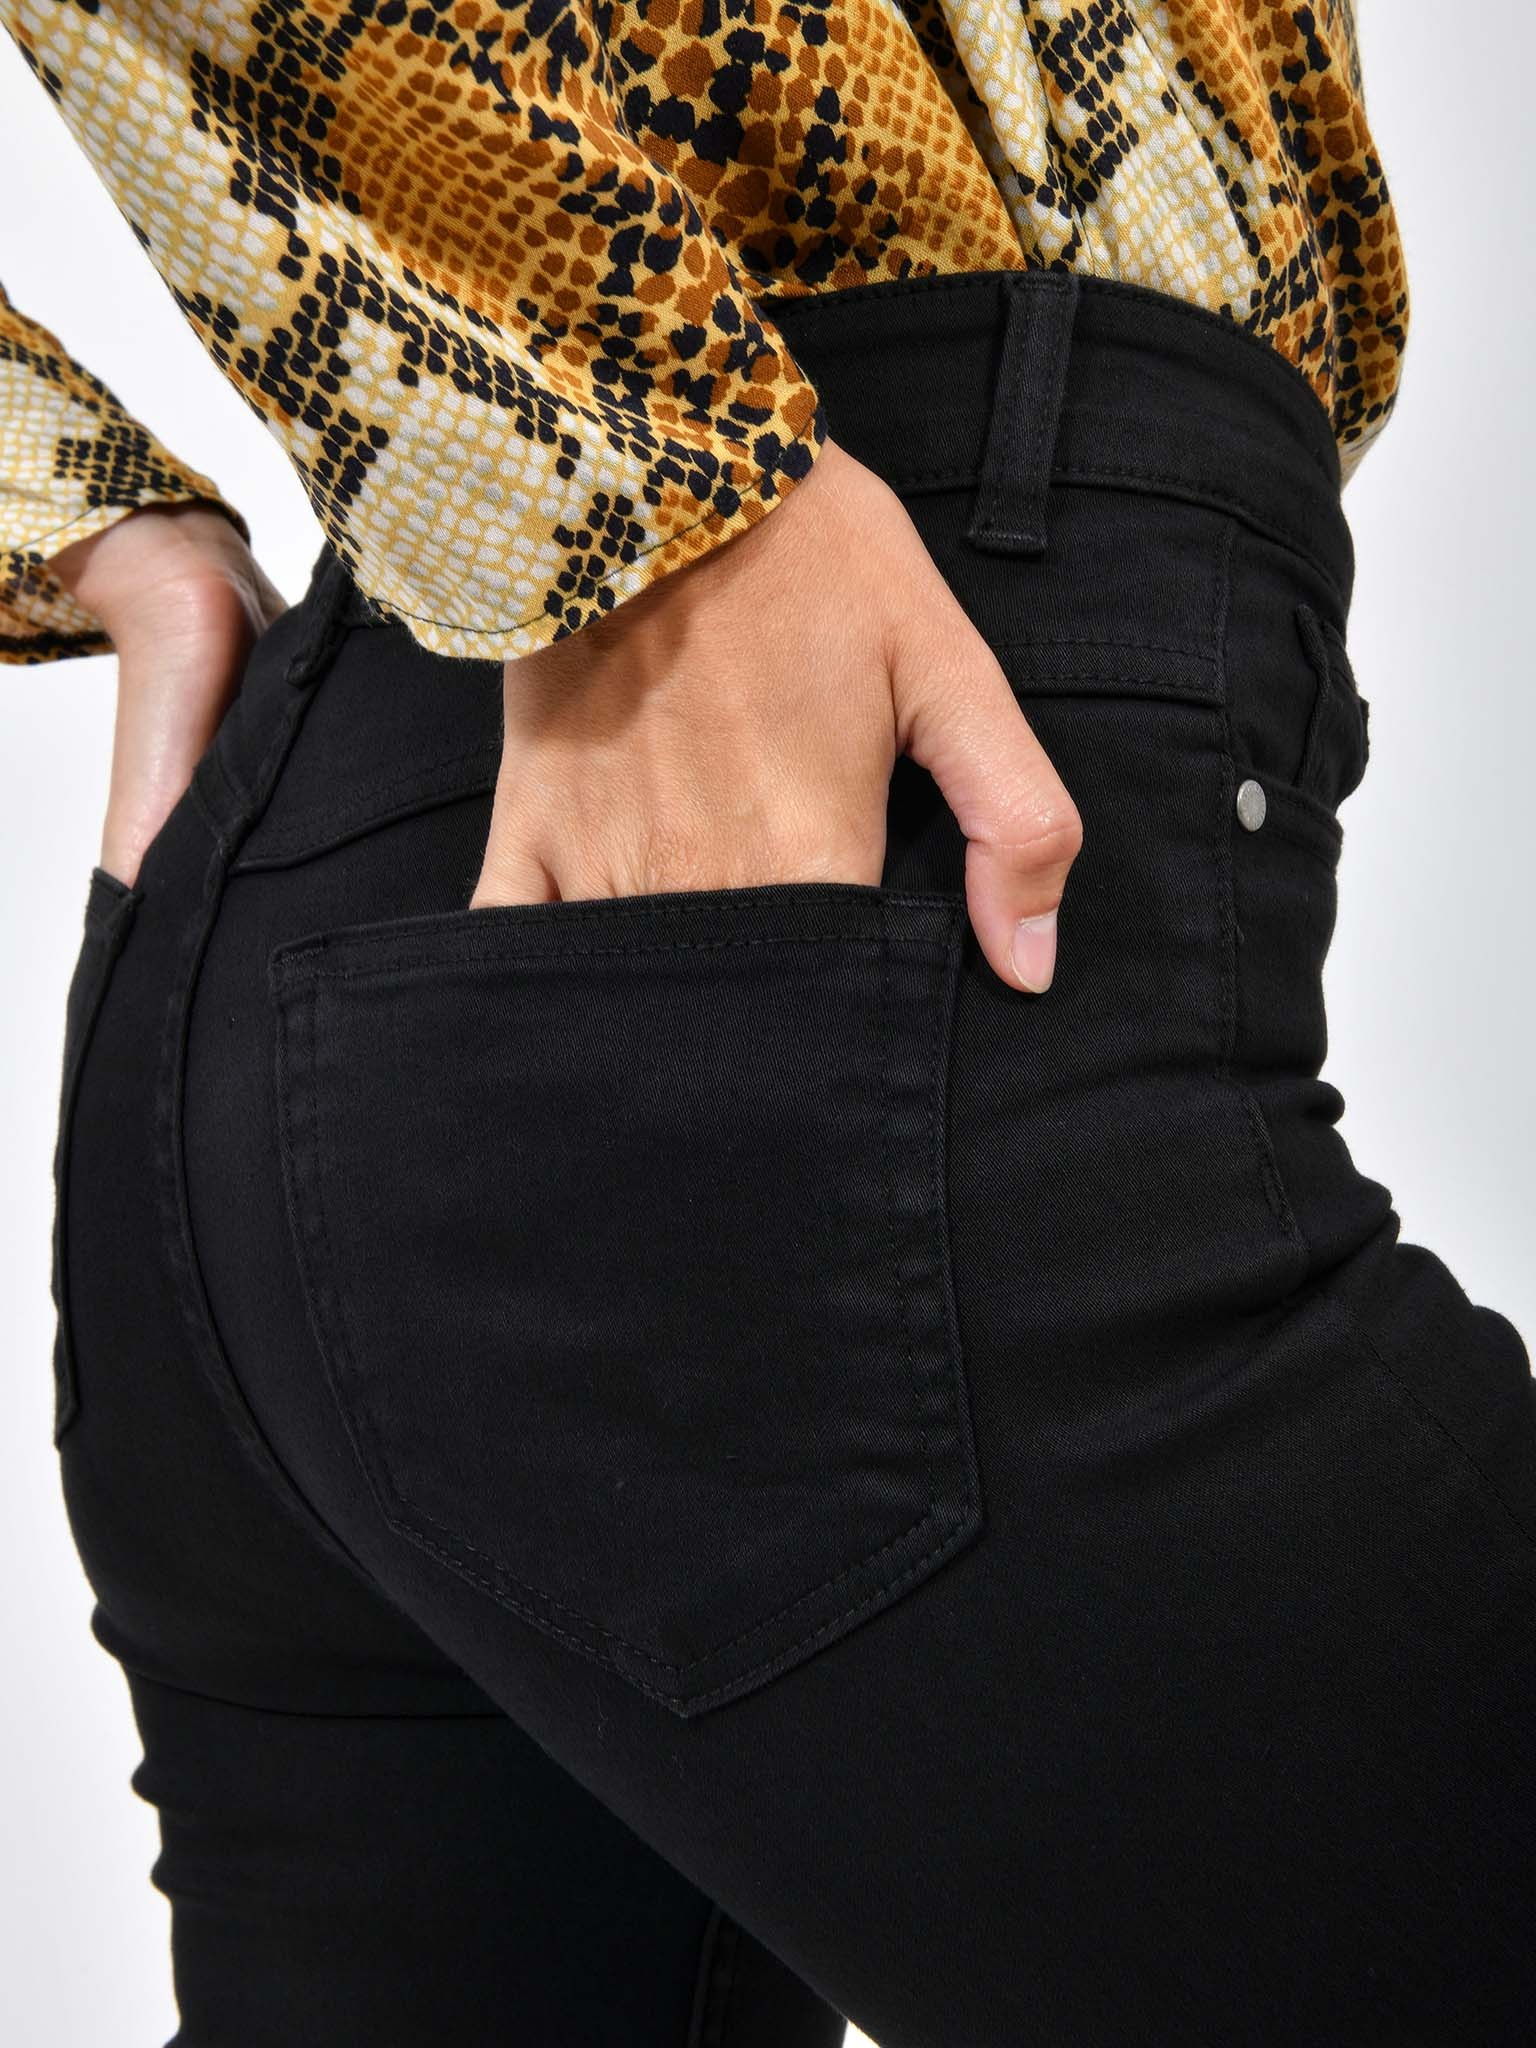 Señora vaqueros pitillo Skinny slim fit Jeans Hose tubos pantalones cadera Stretch azul /< fa />